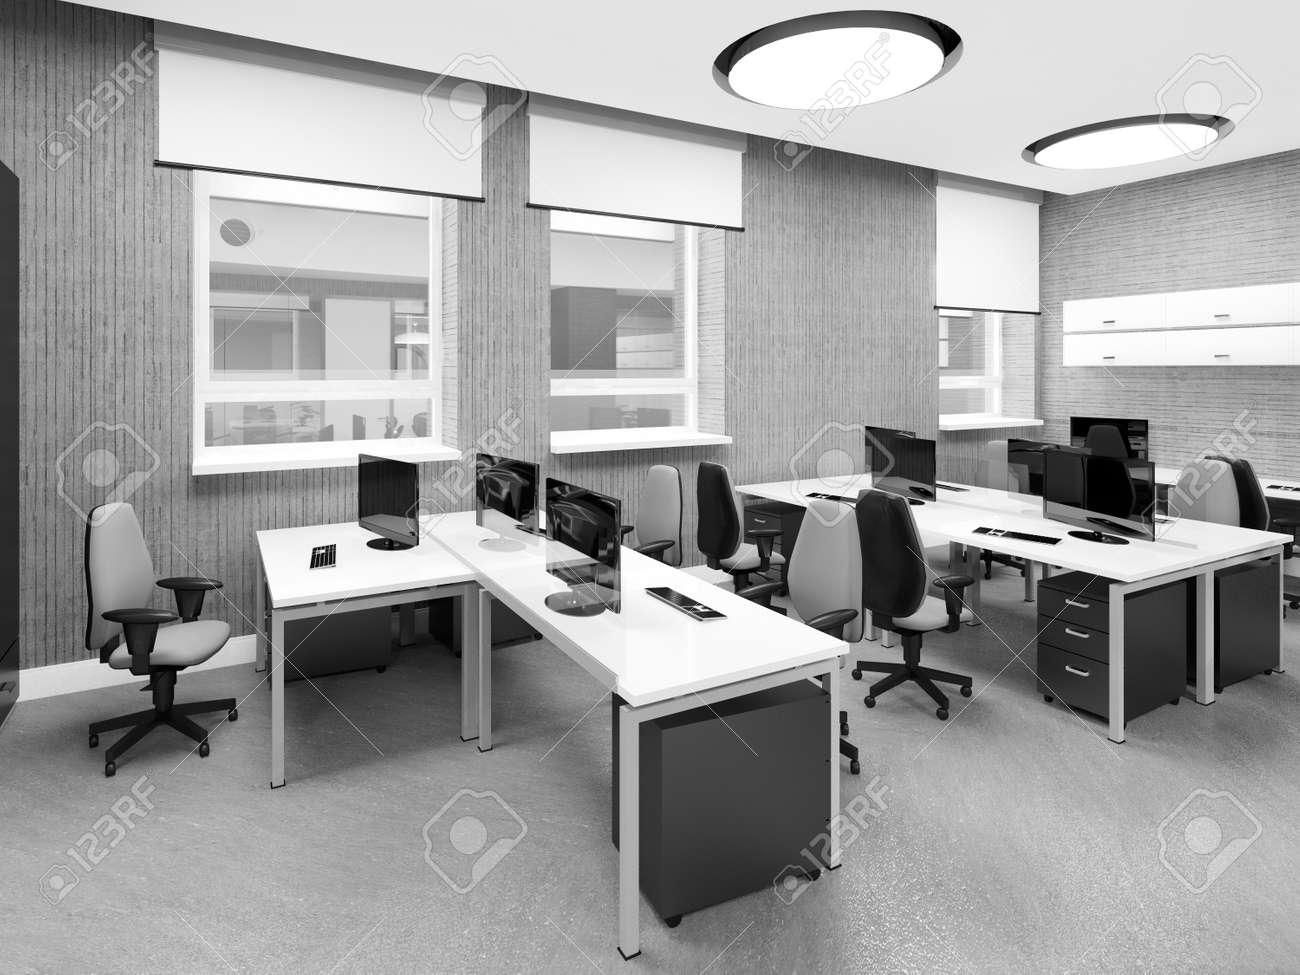 Empty modern office interior work place 3D illustration Stock Illustration - 47863238 & Empty Modern Office Interior Work Place 3D Illustration Stock Photo ...